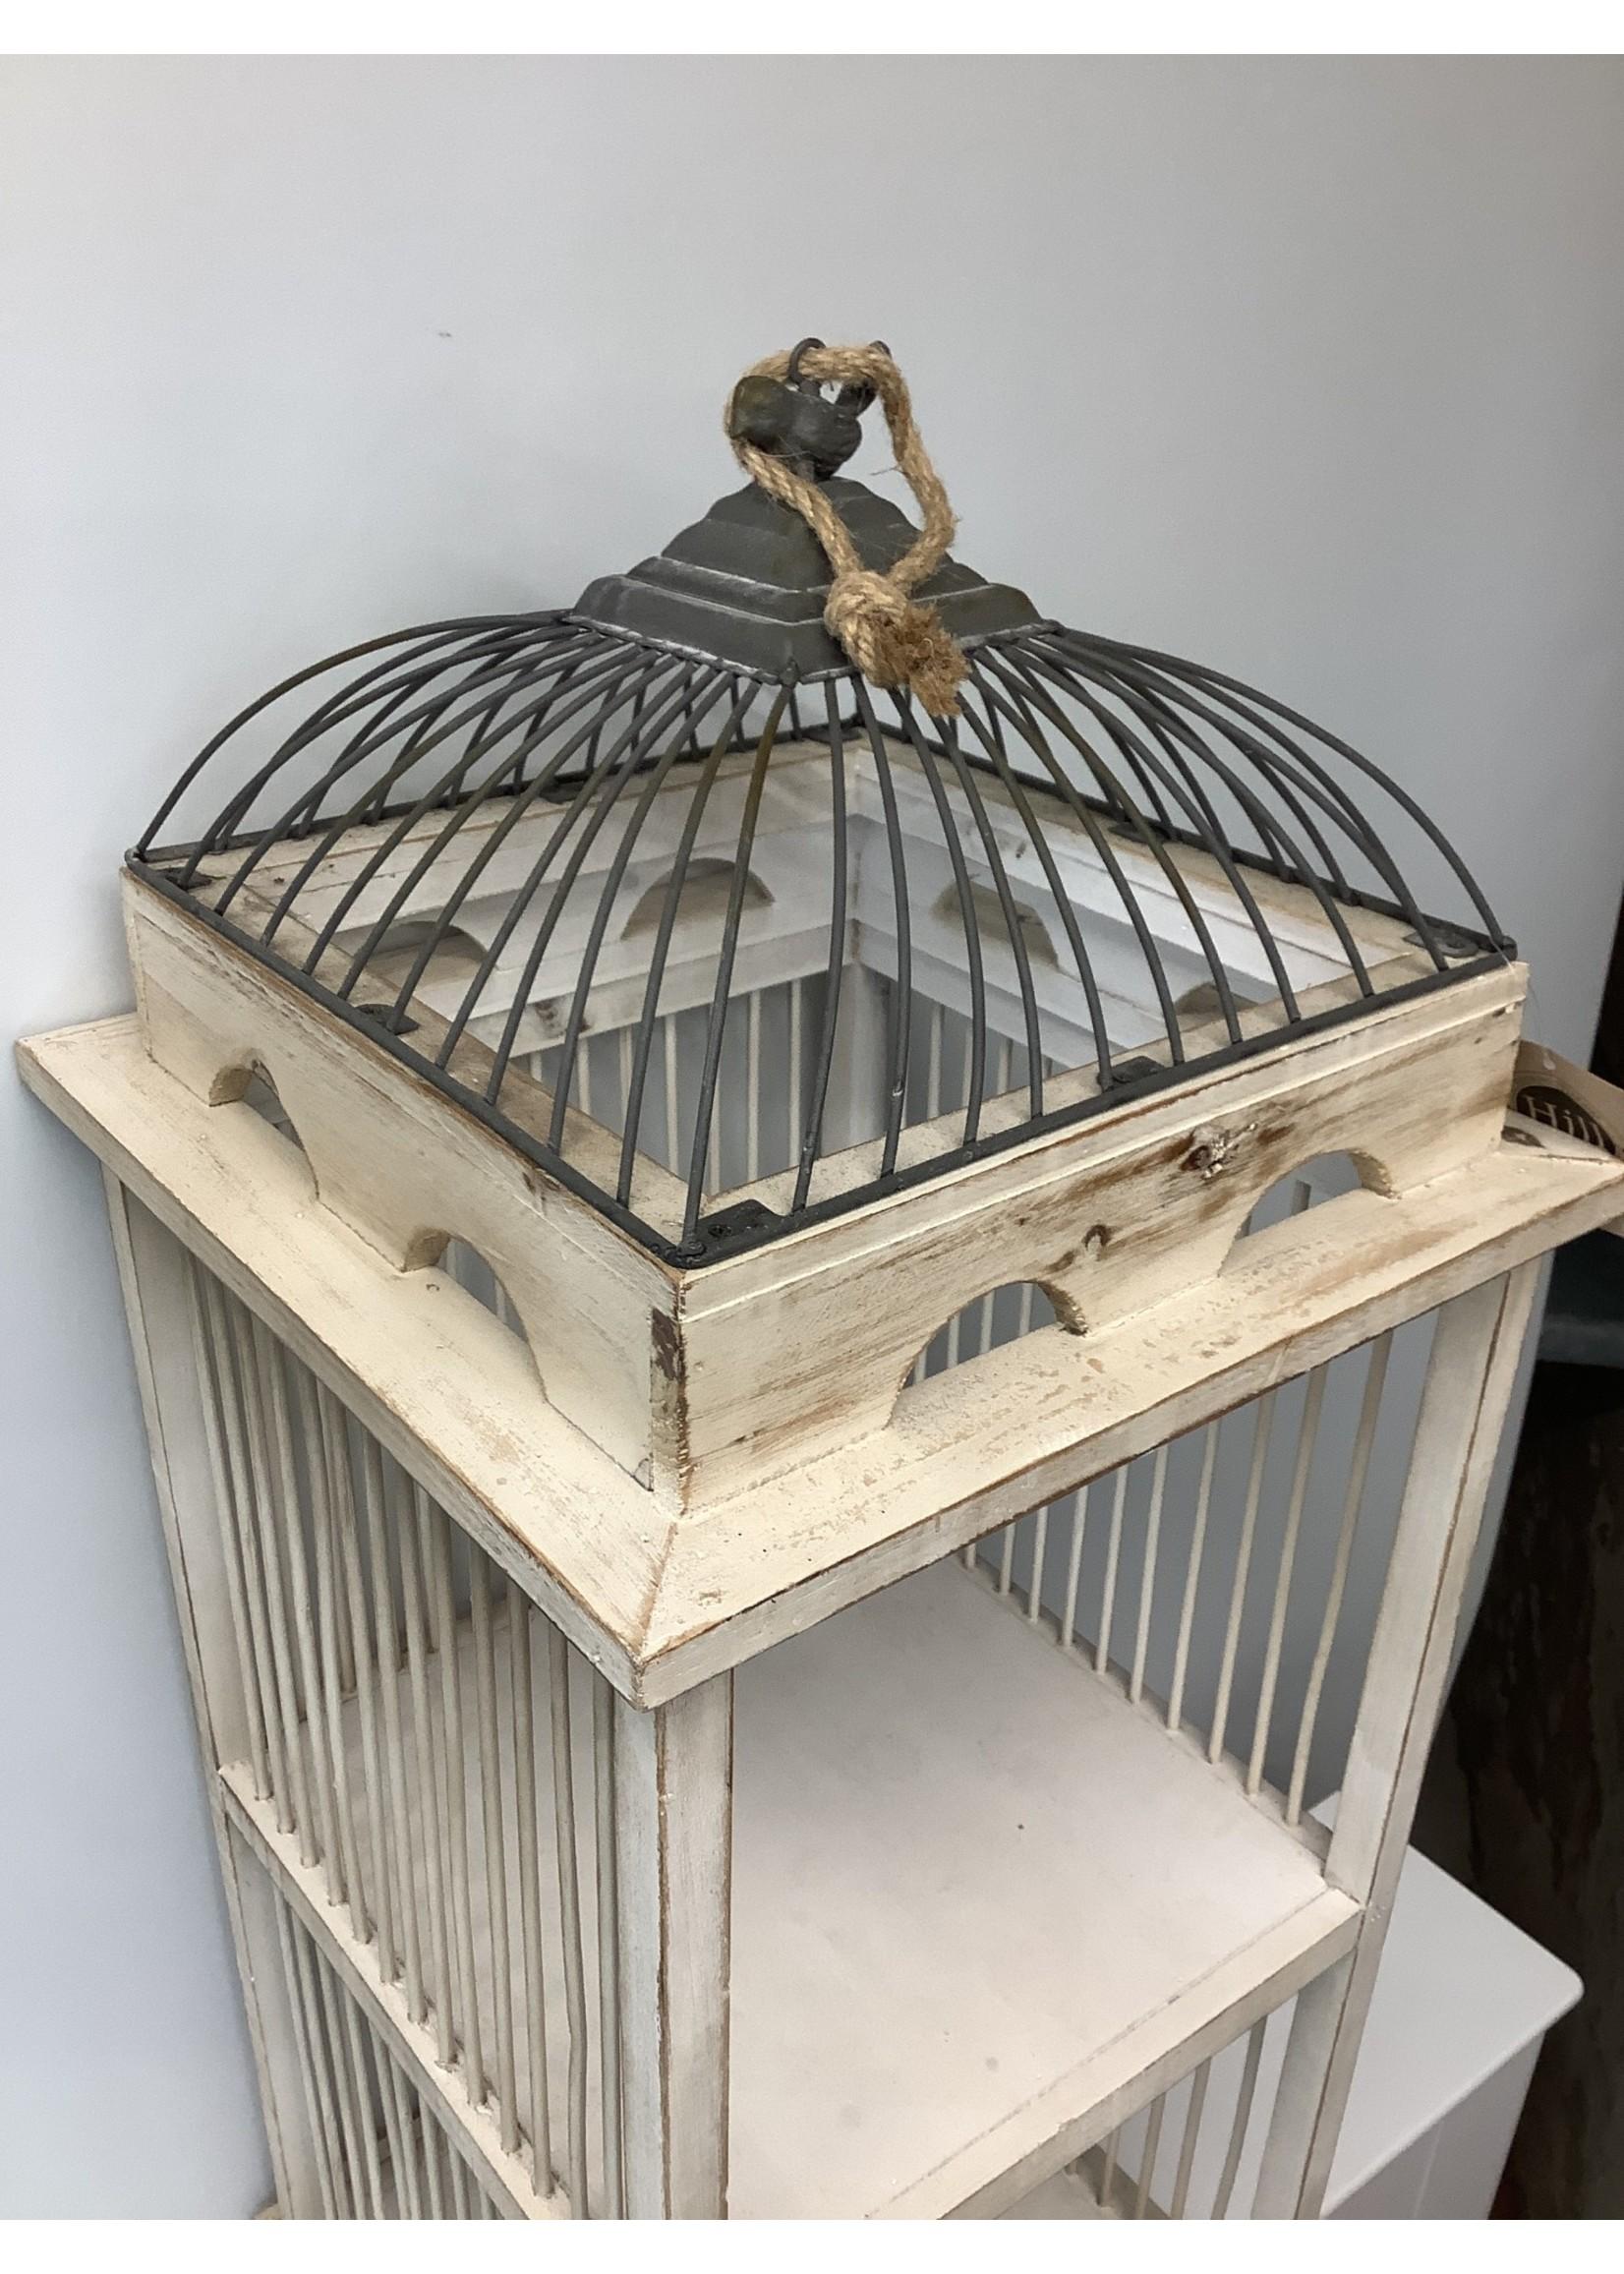 Bird Cage 95cm tall x 35cm wide